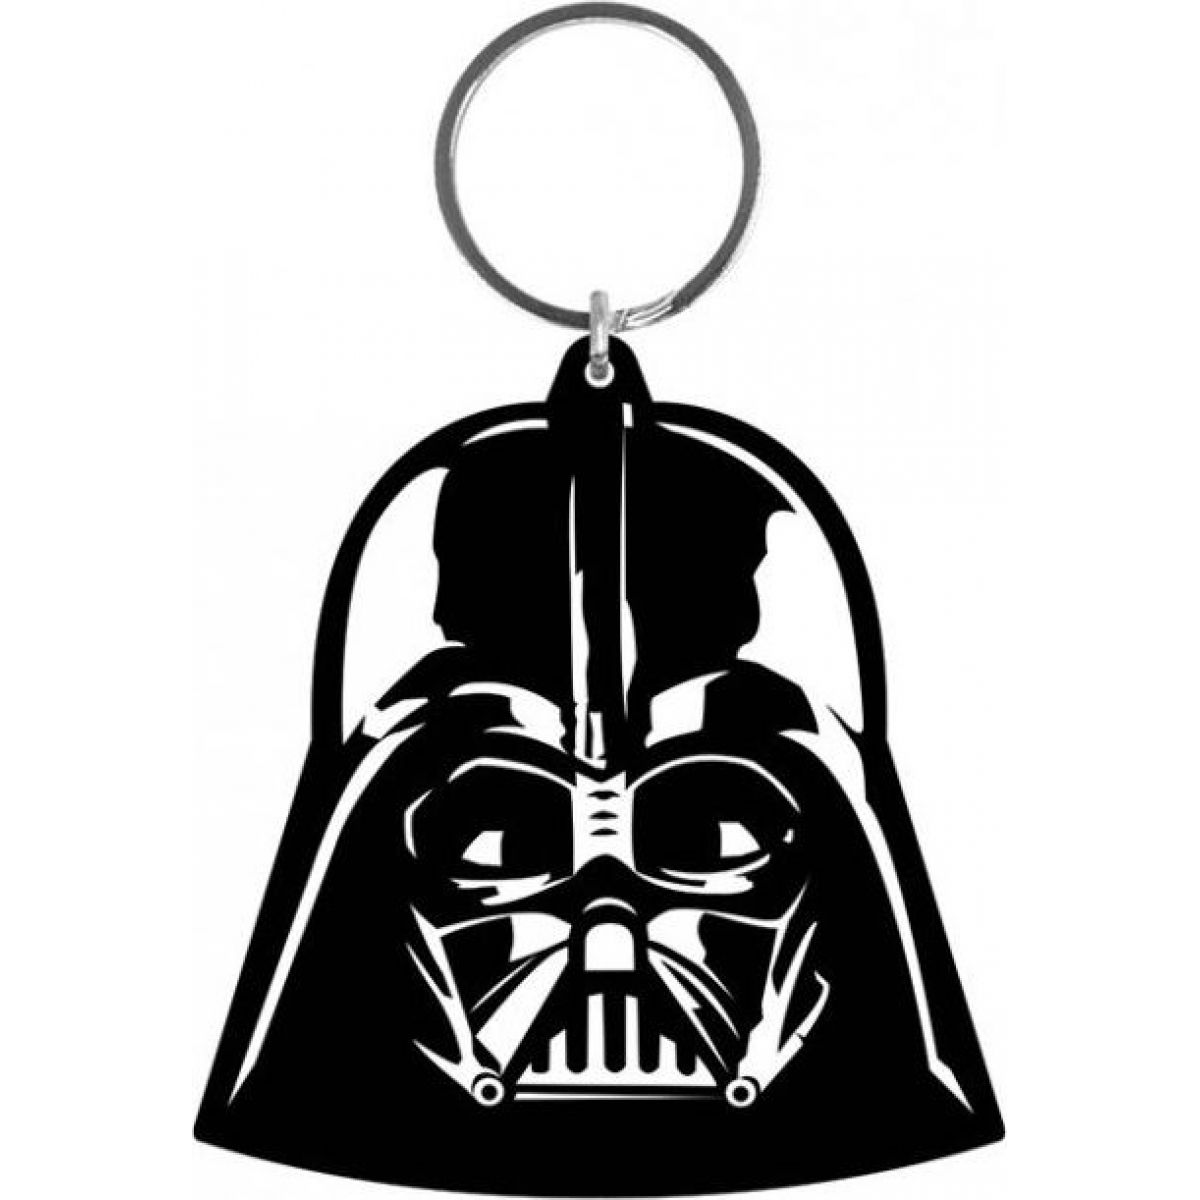 Klíčenka gumová Star Wars Darth Vader